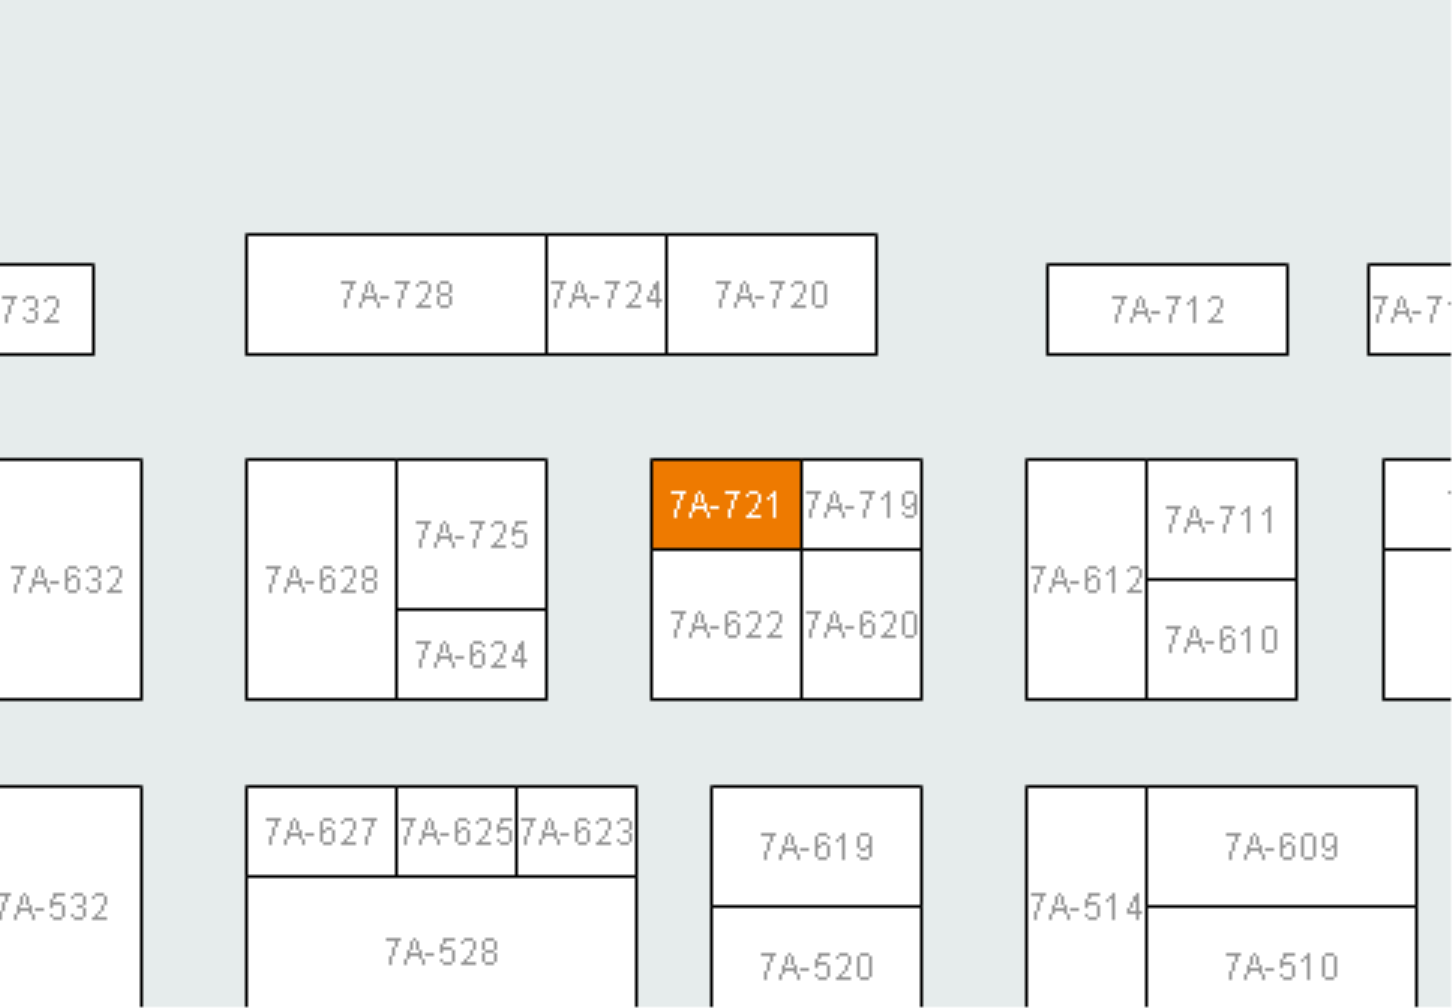 7A / 7A-721